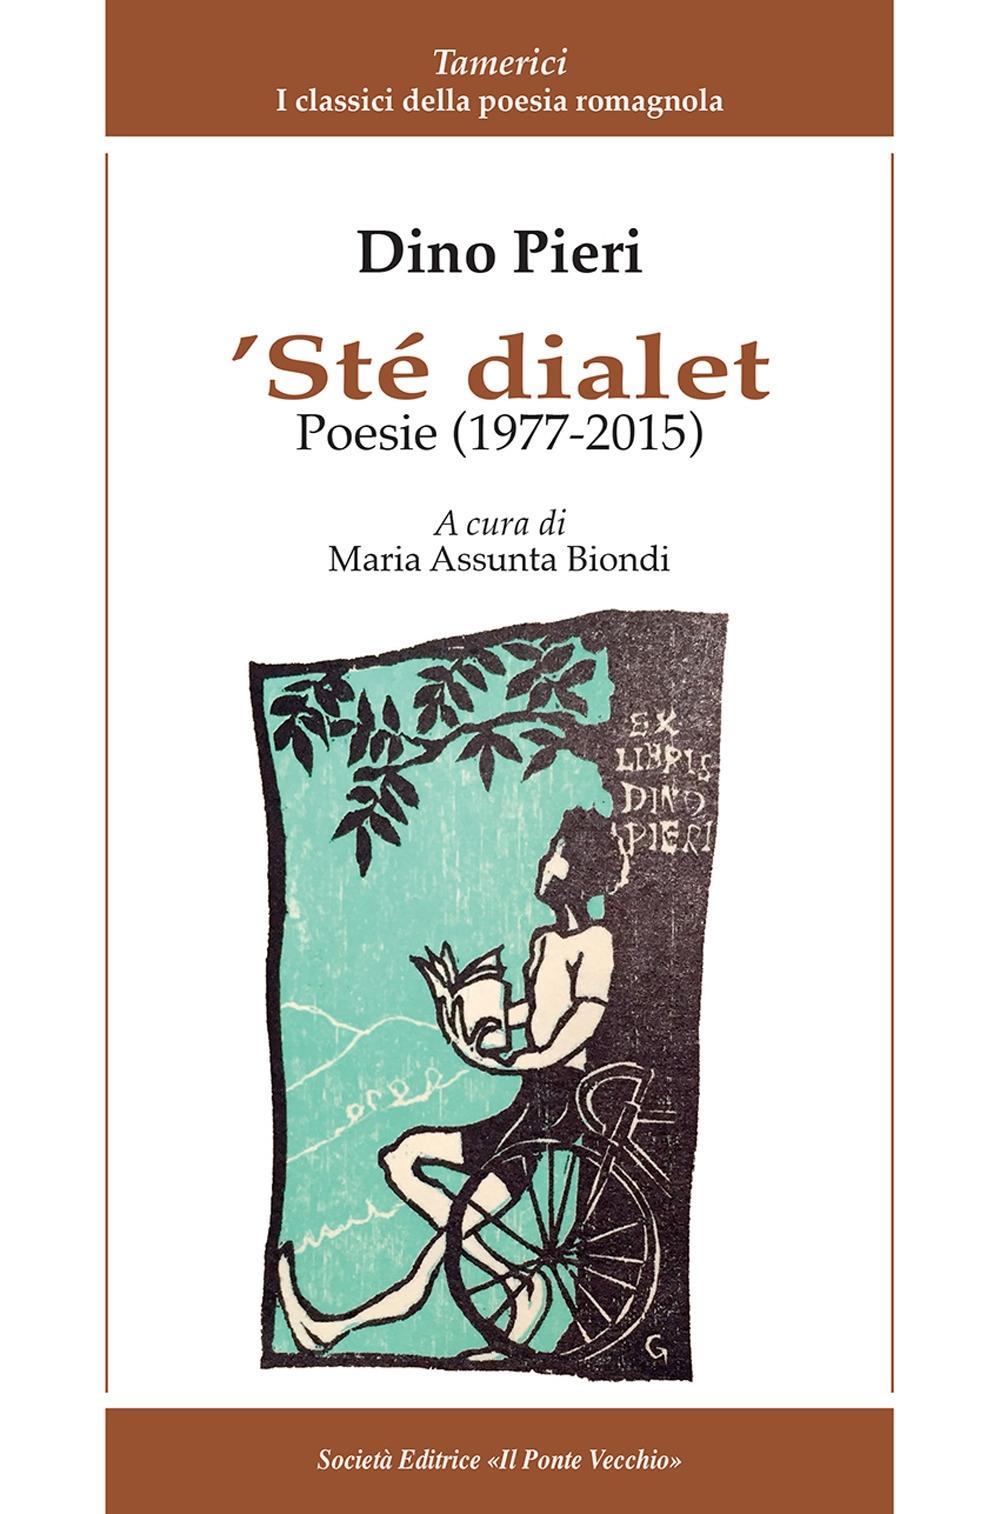 'Ste dialet. Poesie (1977-2015). Testo italiano a fronte